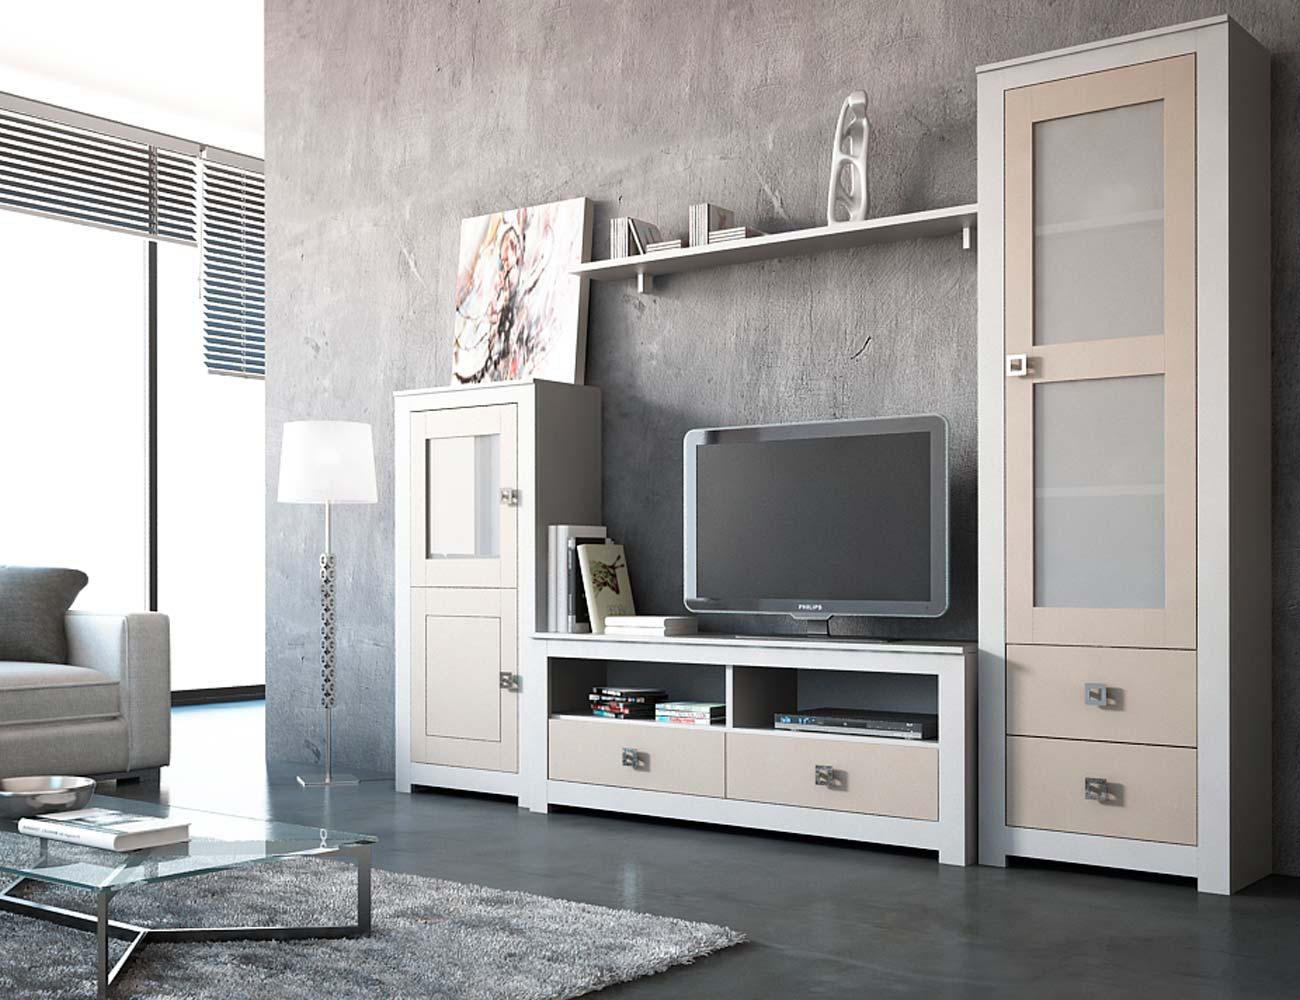 2 mueble salon modular lacado blanco piedra madera dm5